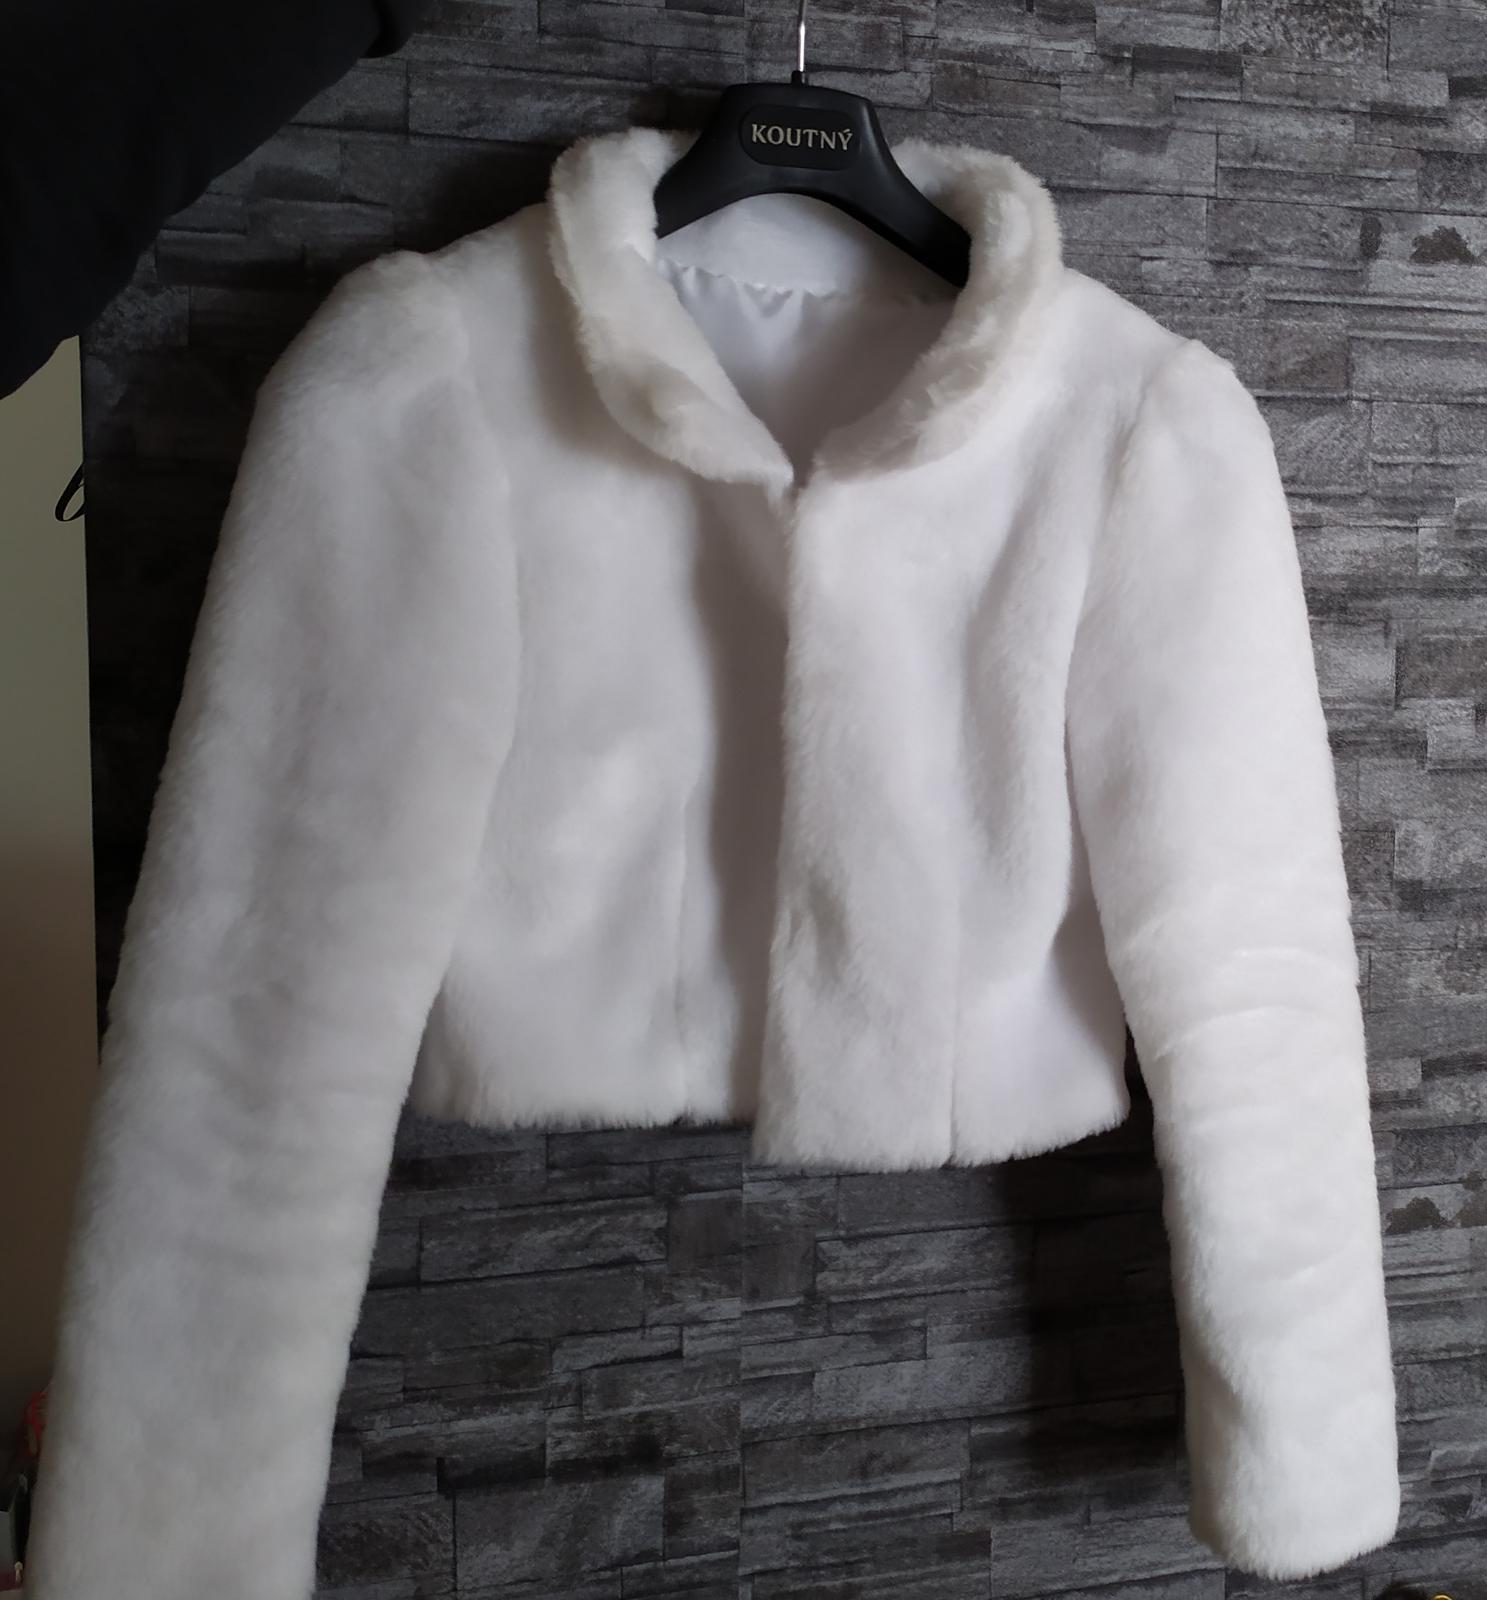 mäkký kabátik pre nevestu - Obrázok č. 3